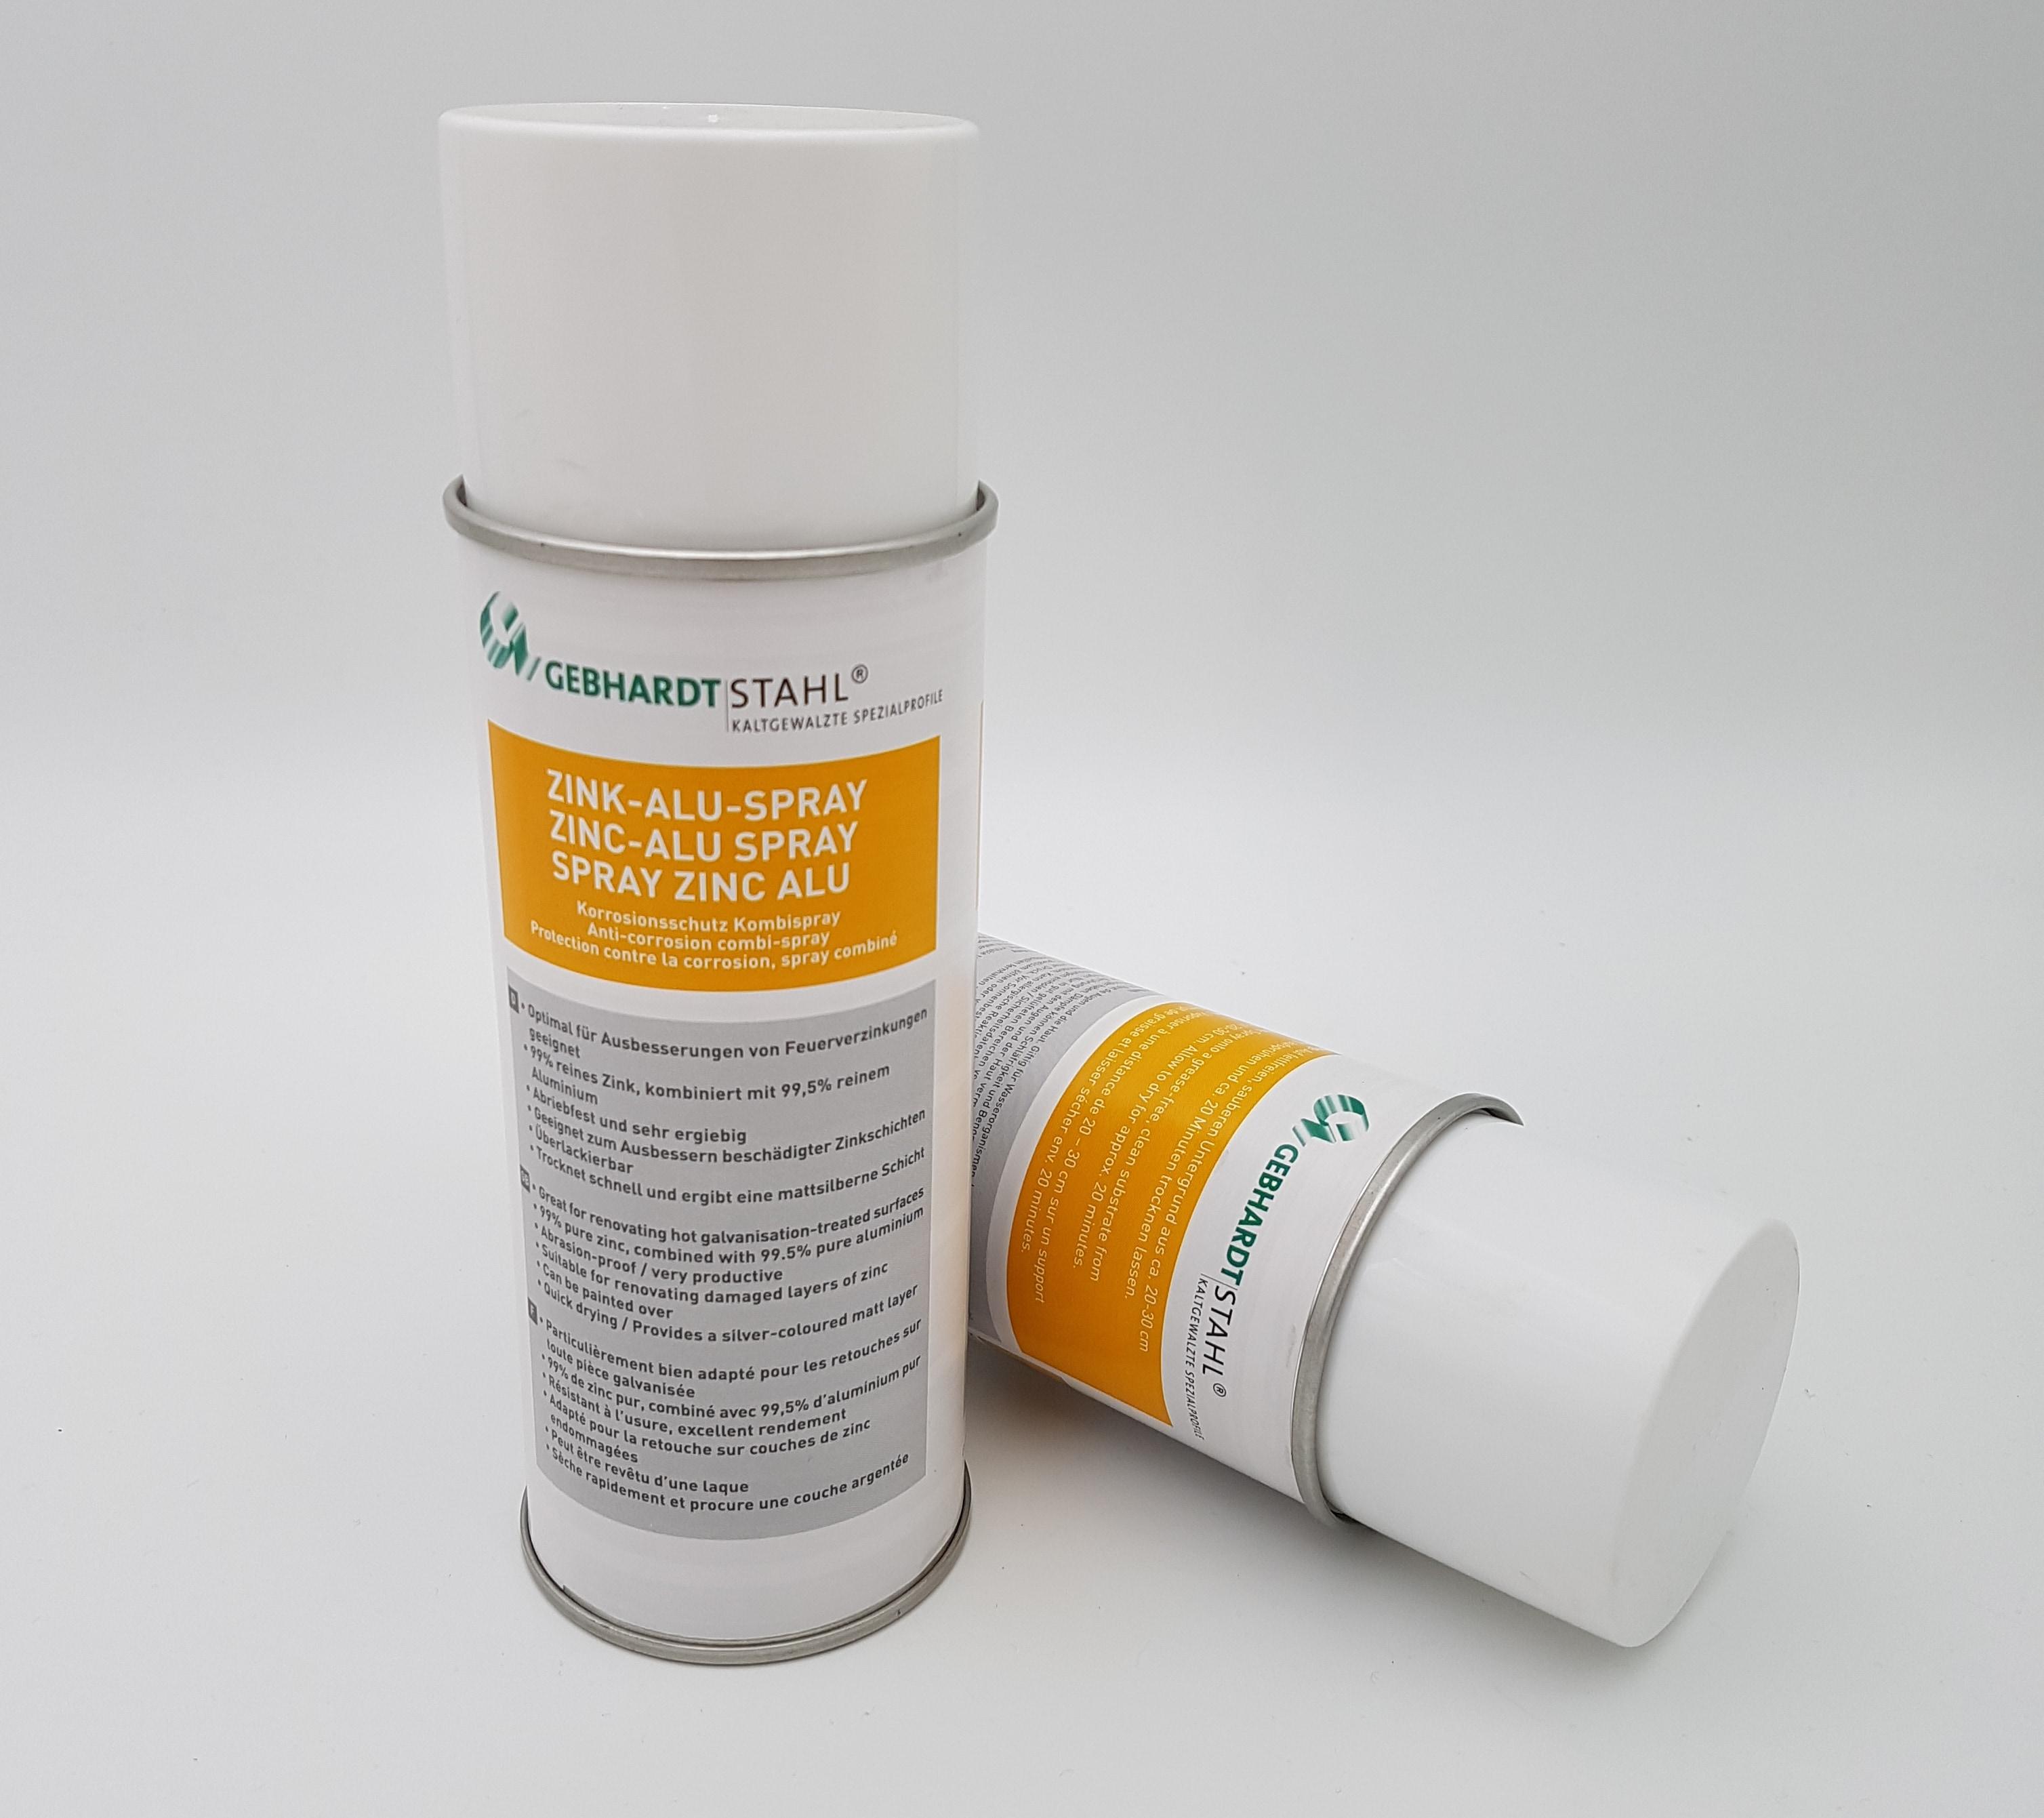 Zink-Alu-Spray Dose 400ml